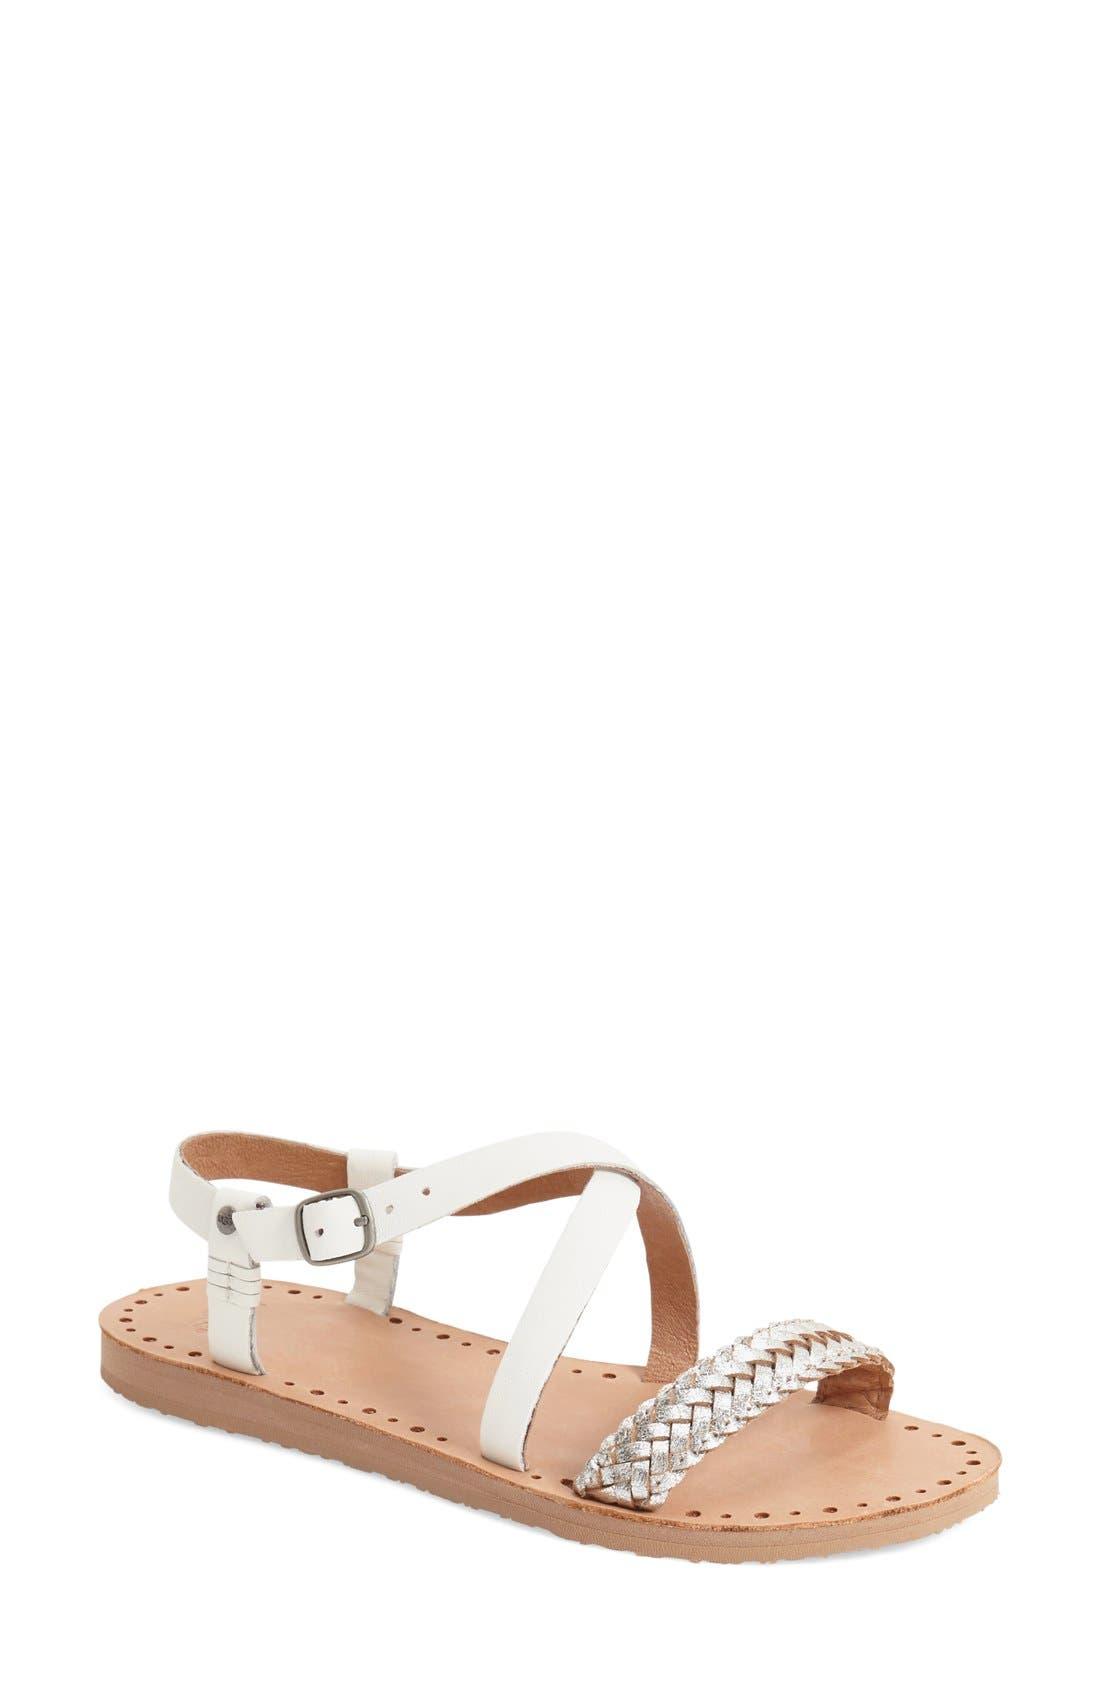 Main Image - UGG® 'Jordyne' Sandal (Women)